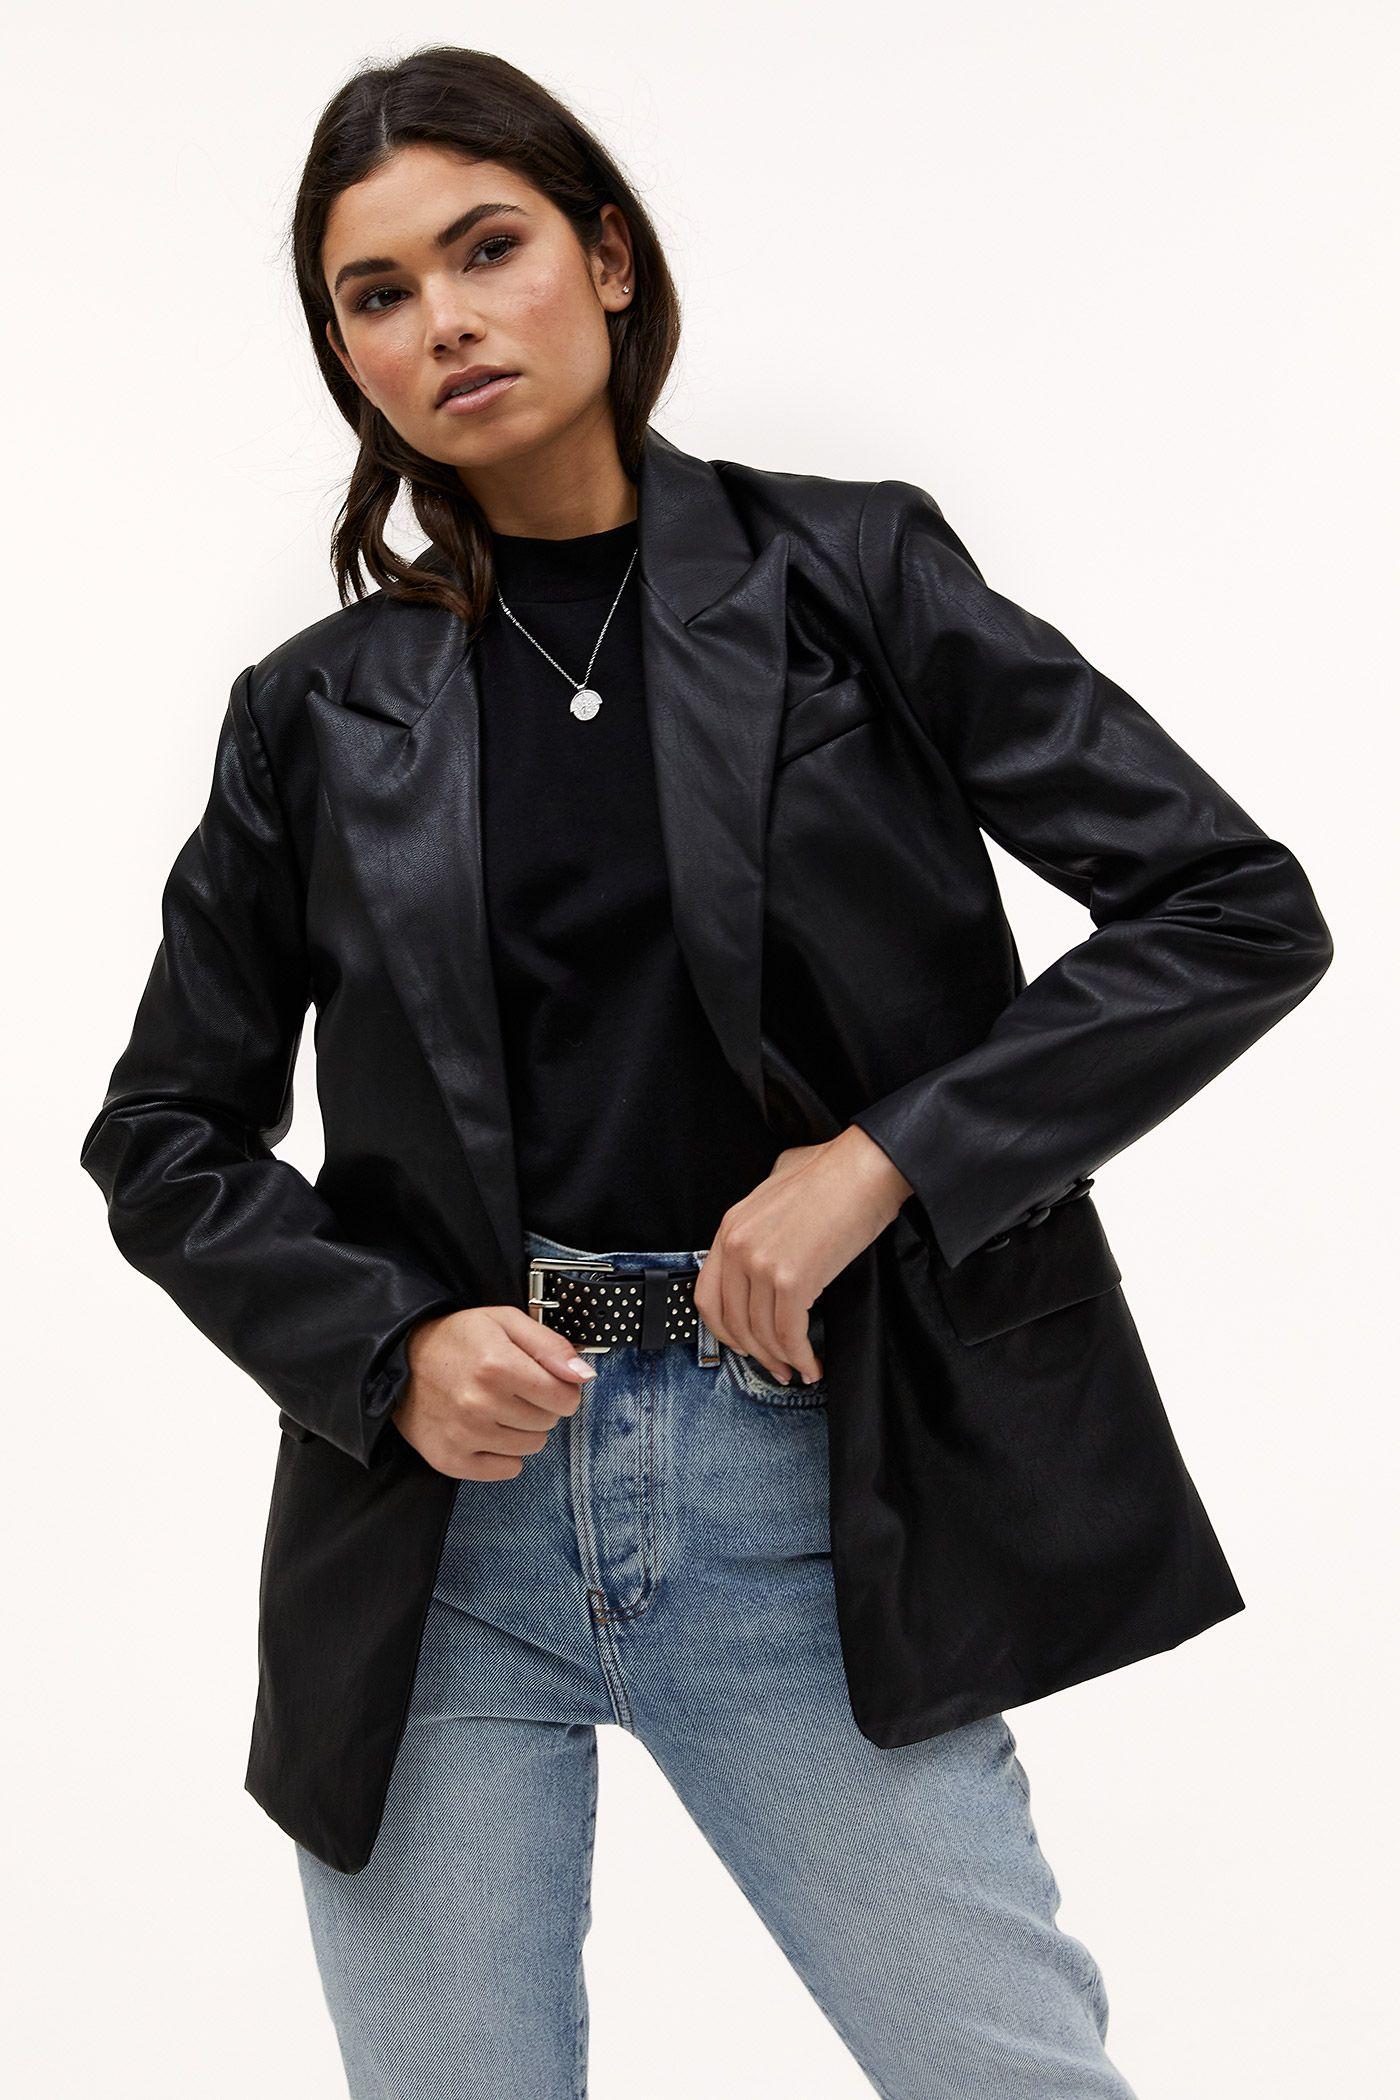 COULD IT BE ME in 2020 | Blazer, Blazer outfit, Lange mouwen